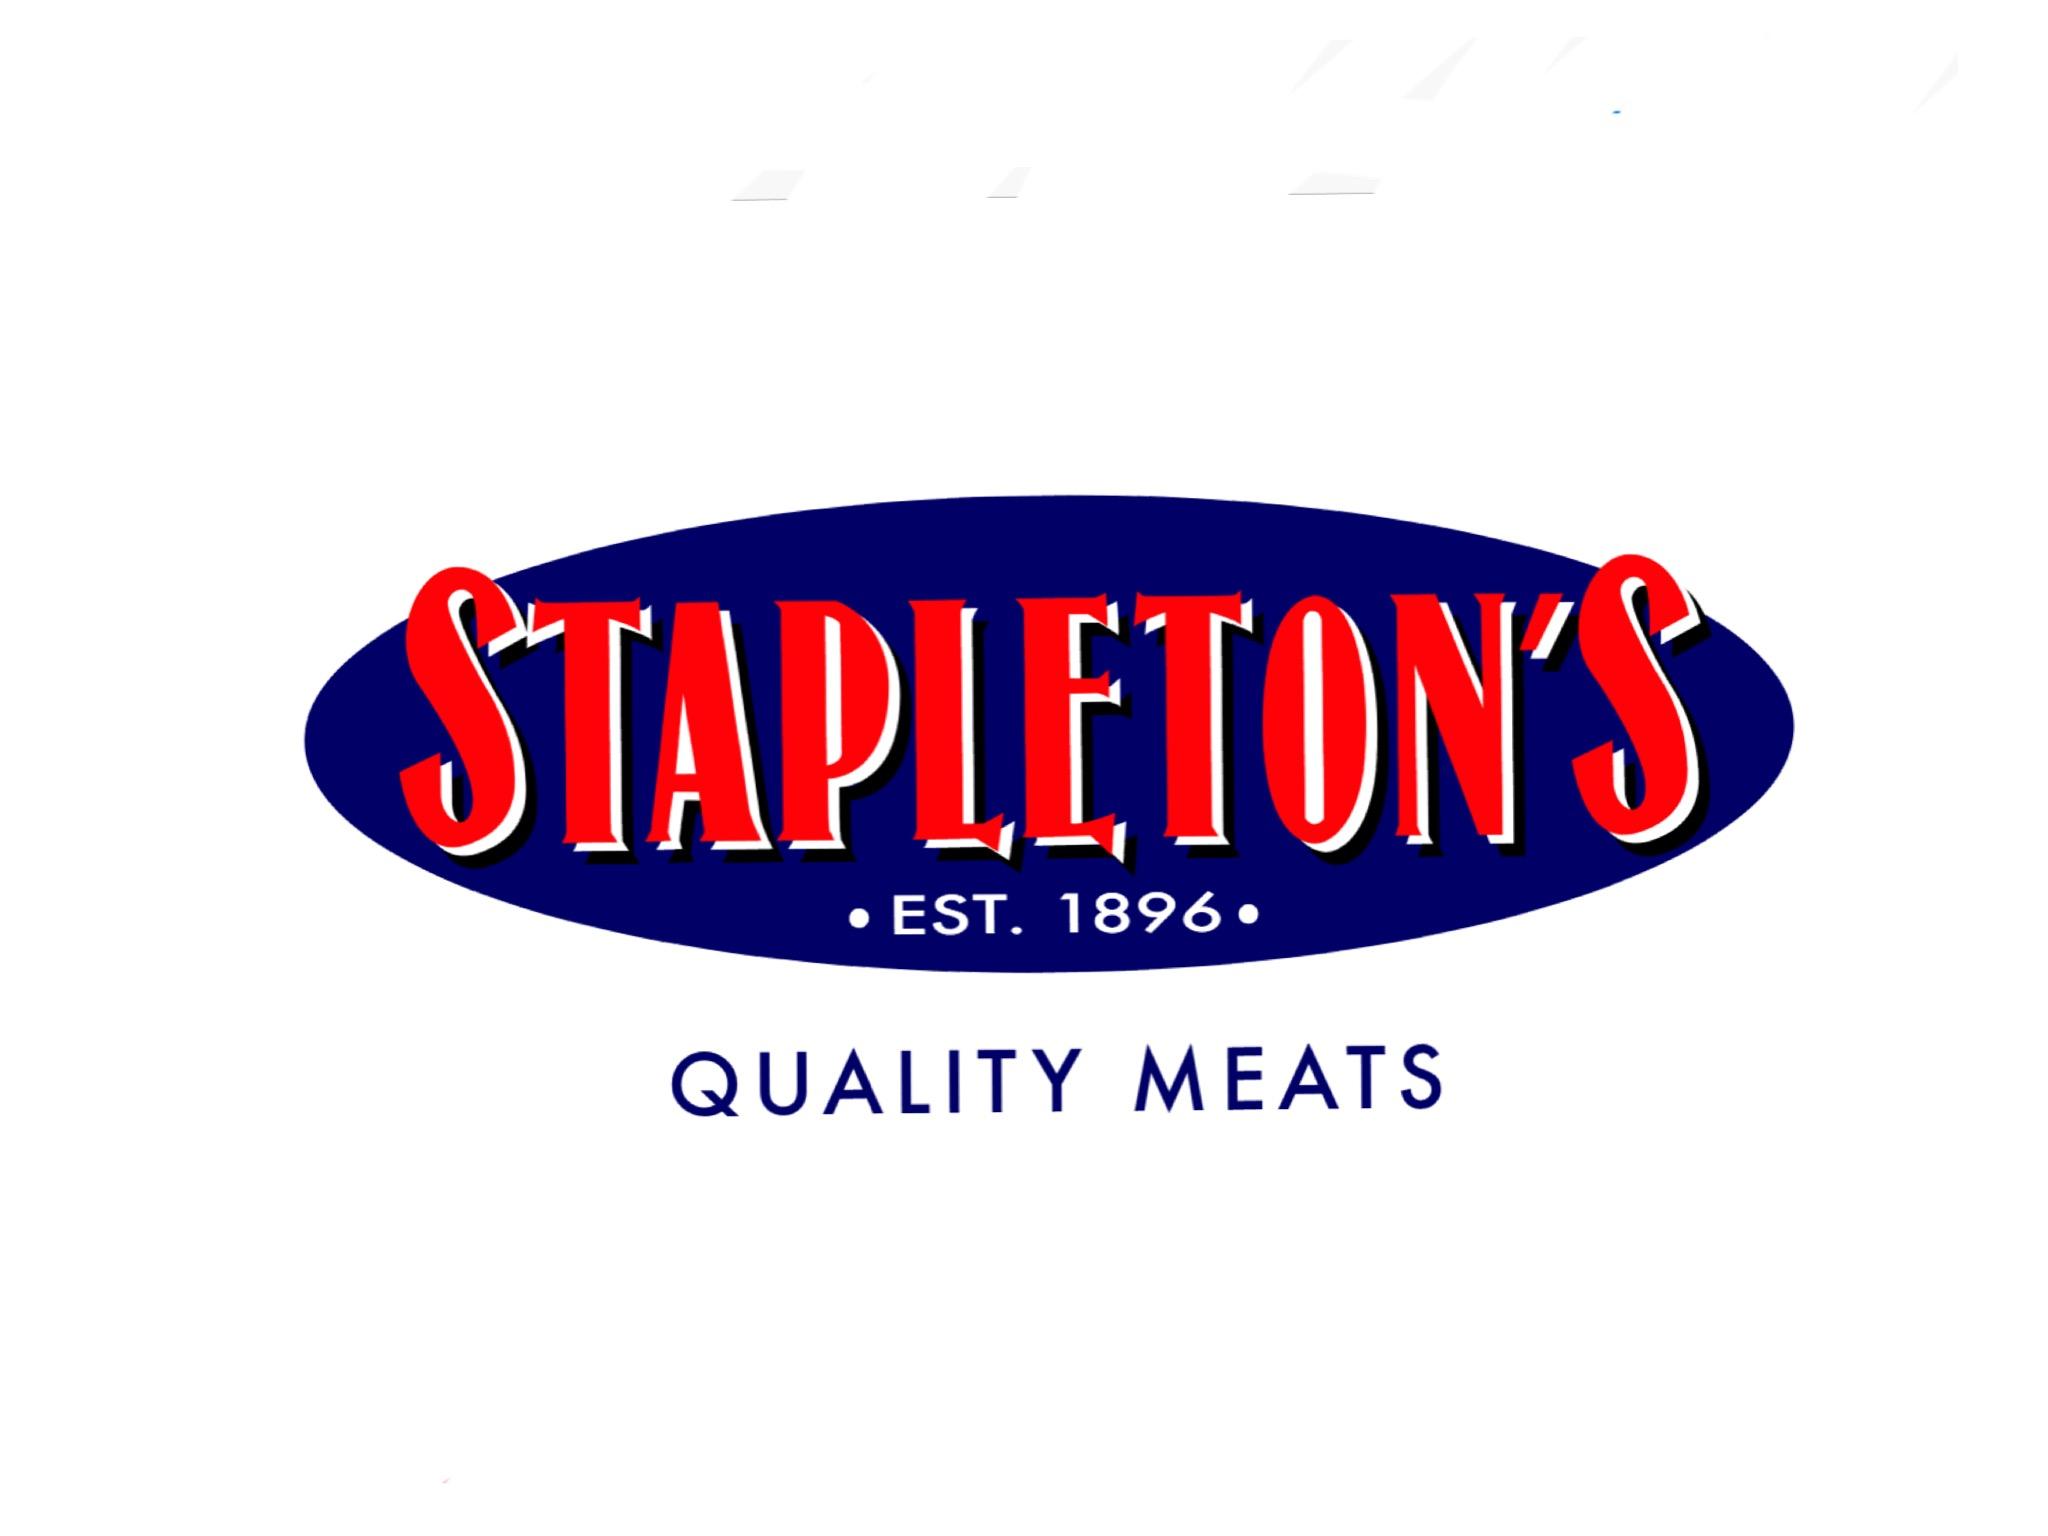 Stapletons Quality Meats: Kareela | Sylvania